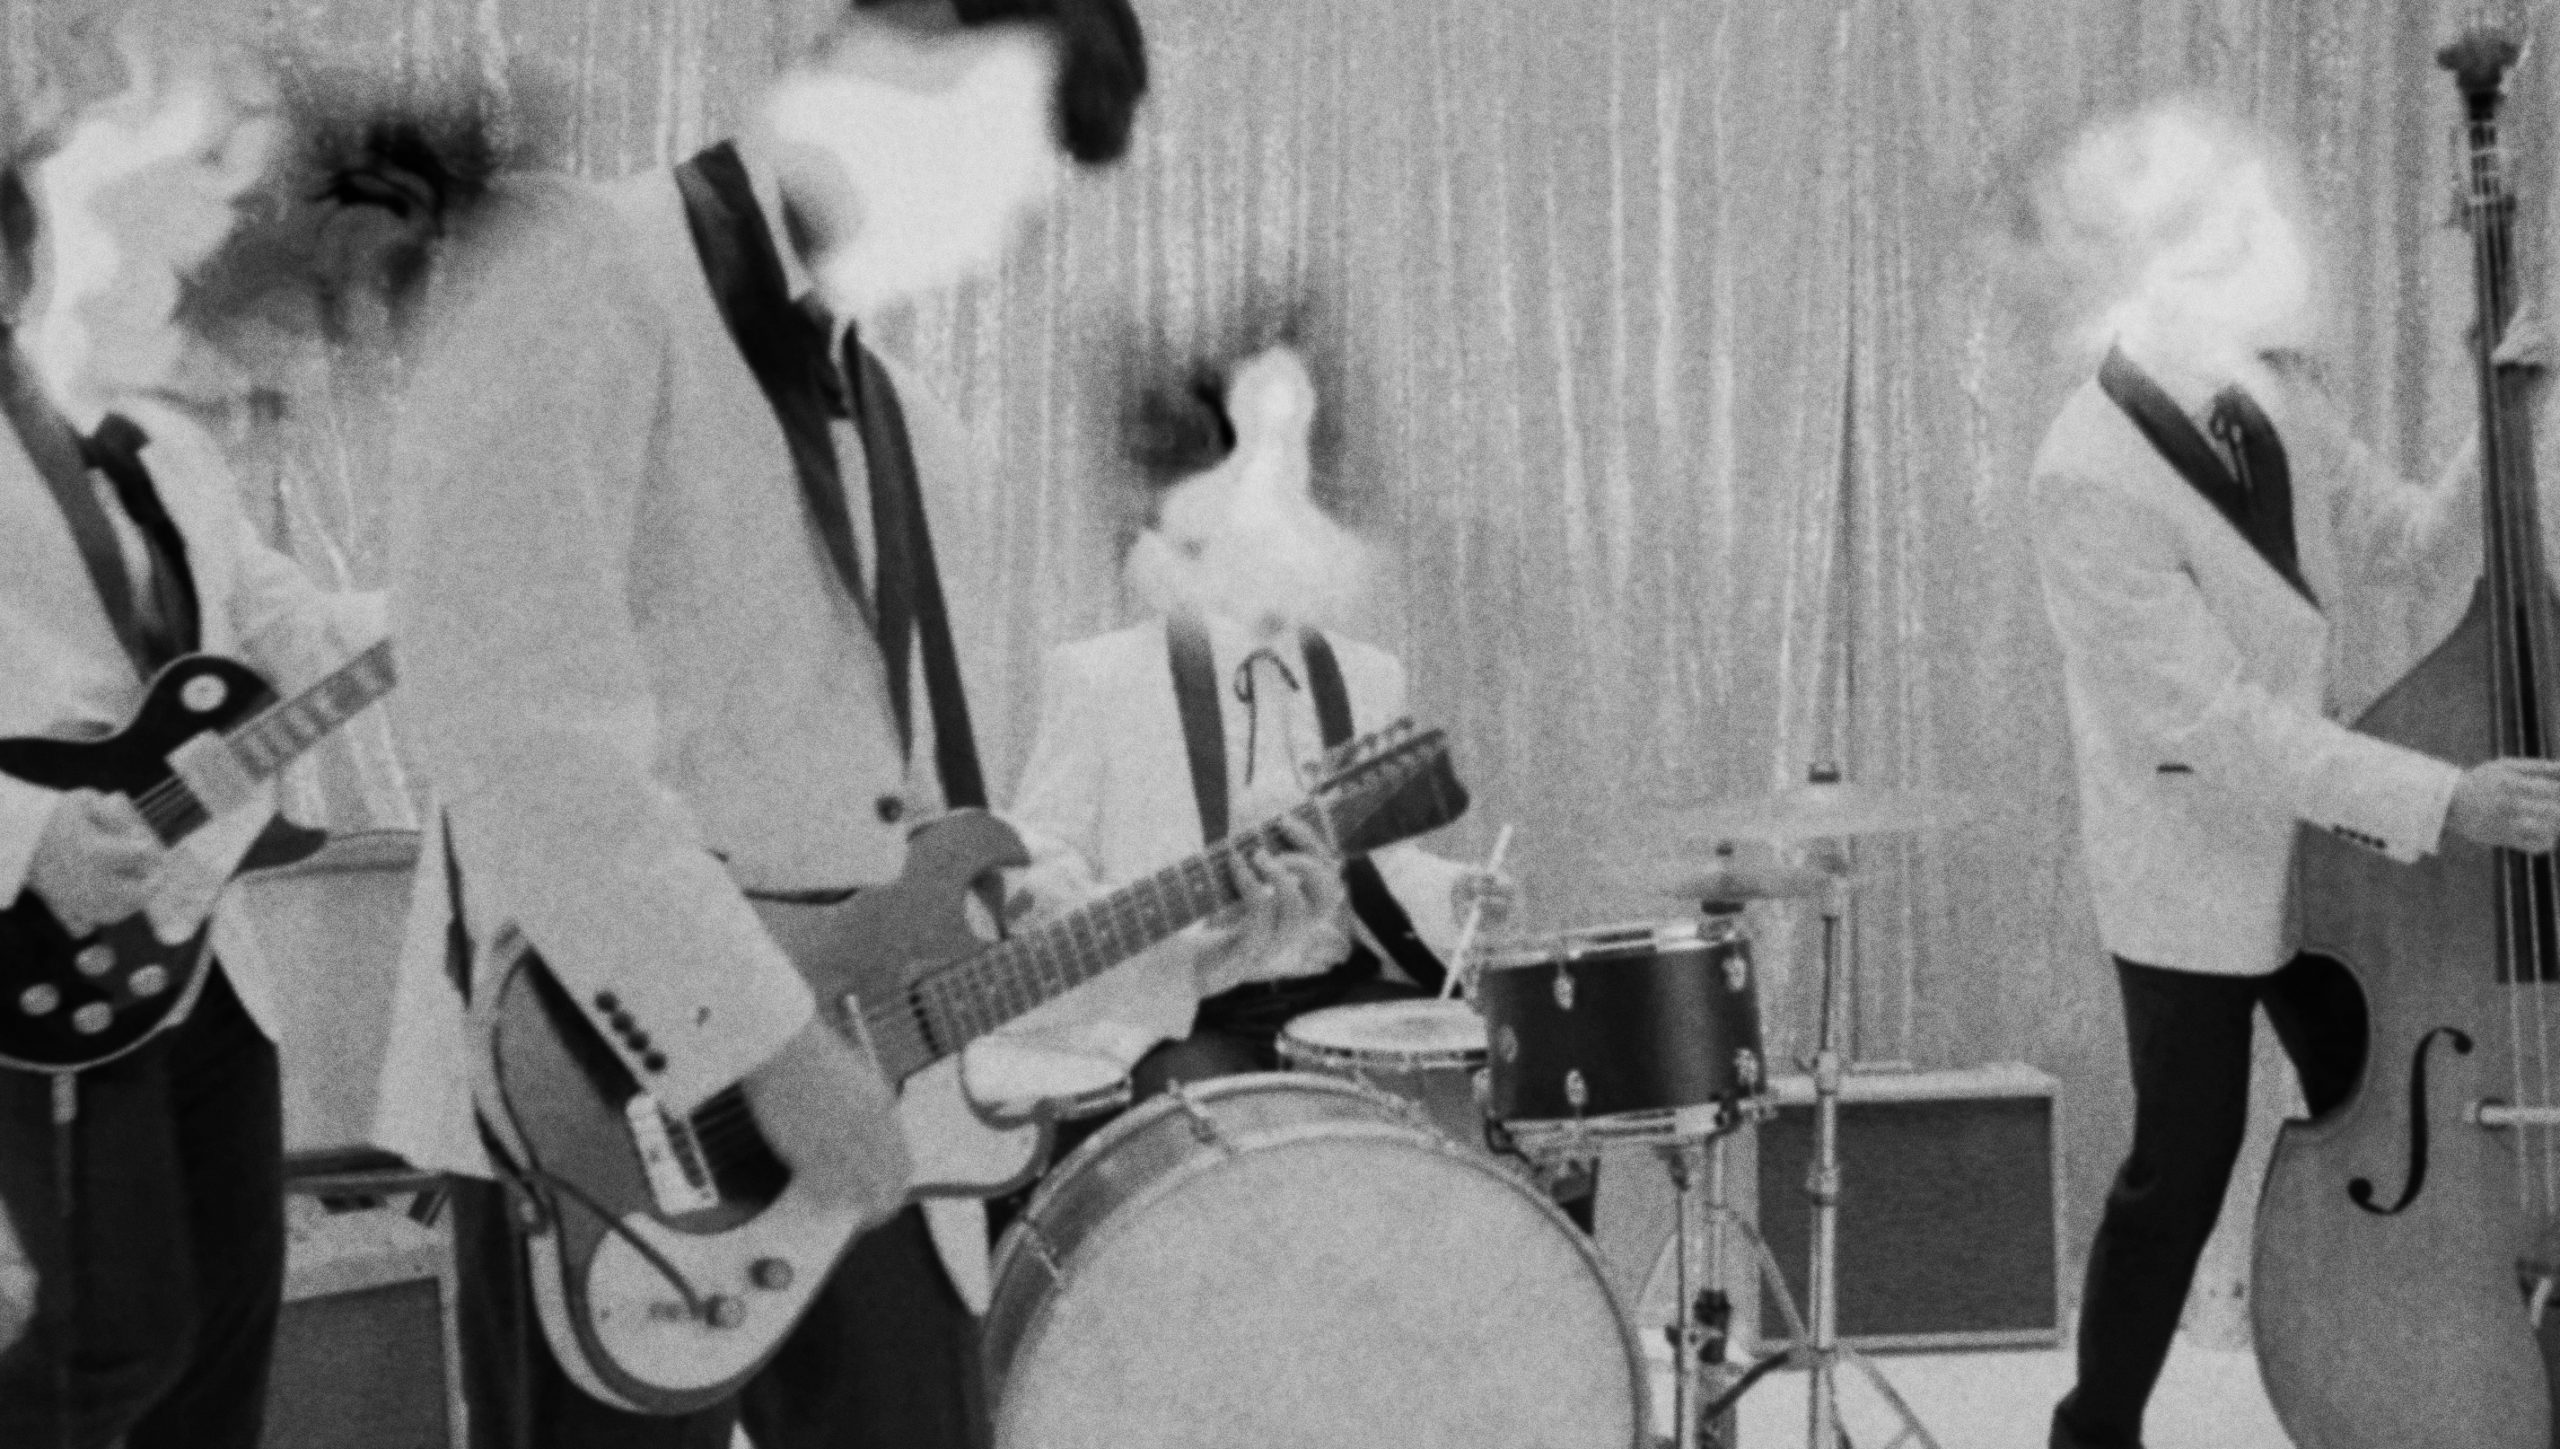 lord huron - USA - indie music - new music - indie rock - indie pop - music blog - indie blog - wolf in a suit - wolfinasuit - wolf in a suit blog - wolf in a suit music blog